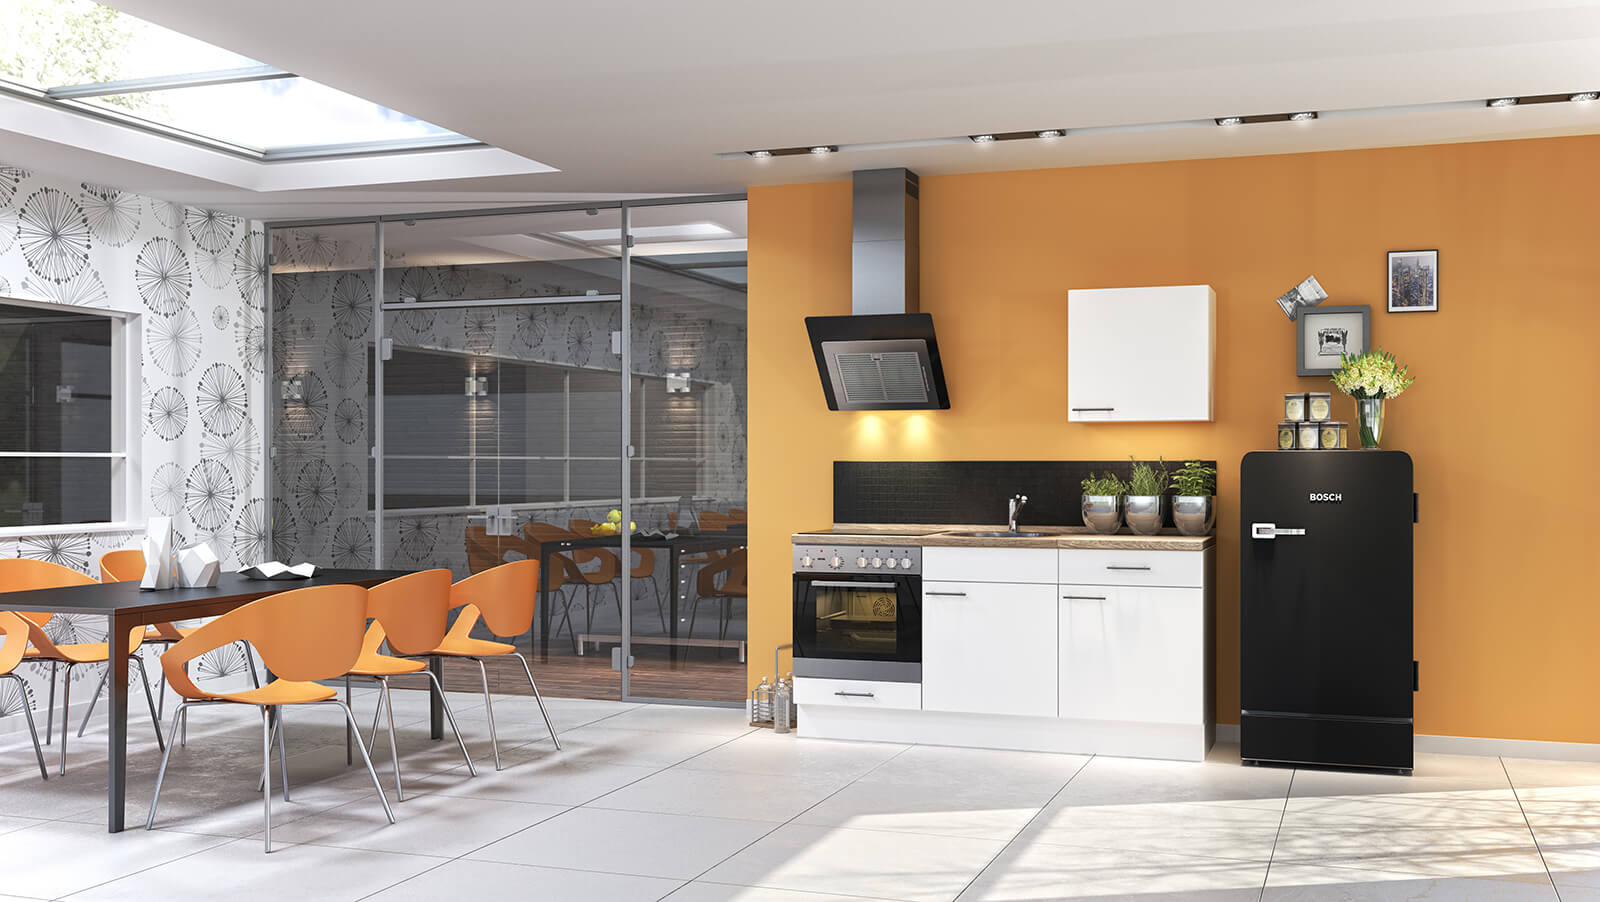 Full Size of In Der Büroküche Gibts Kuchen Büro Küche Sauberkeit Ikea Värde Büroküche Büro Küche Ohne Herd Küche Büroküche